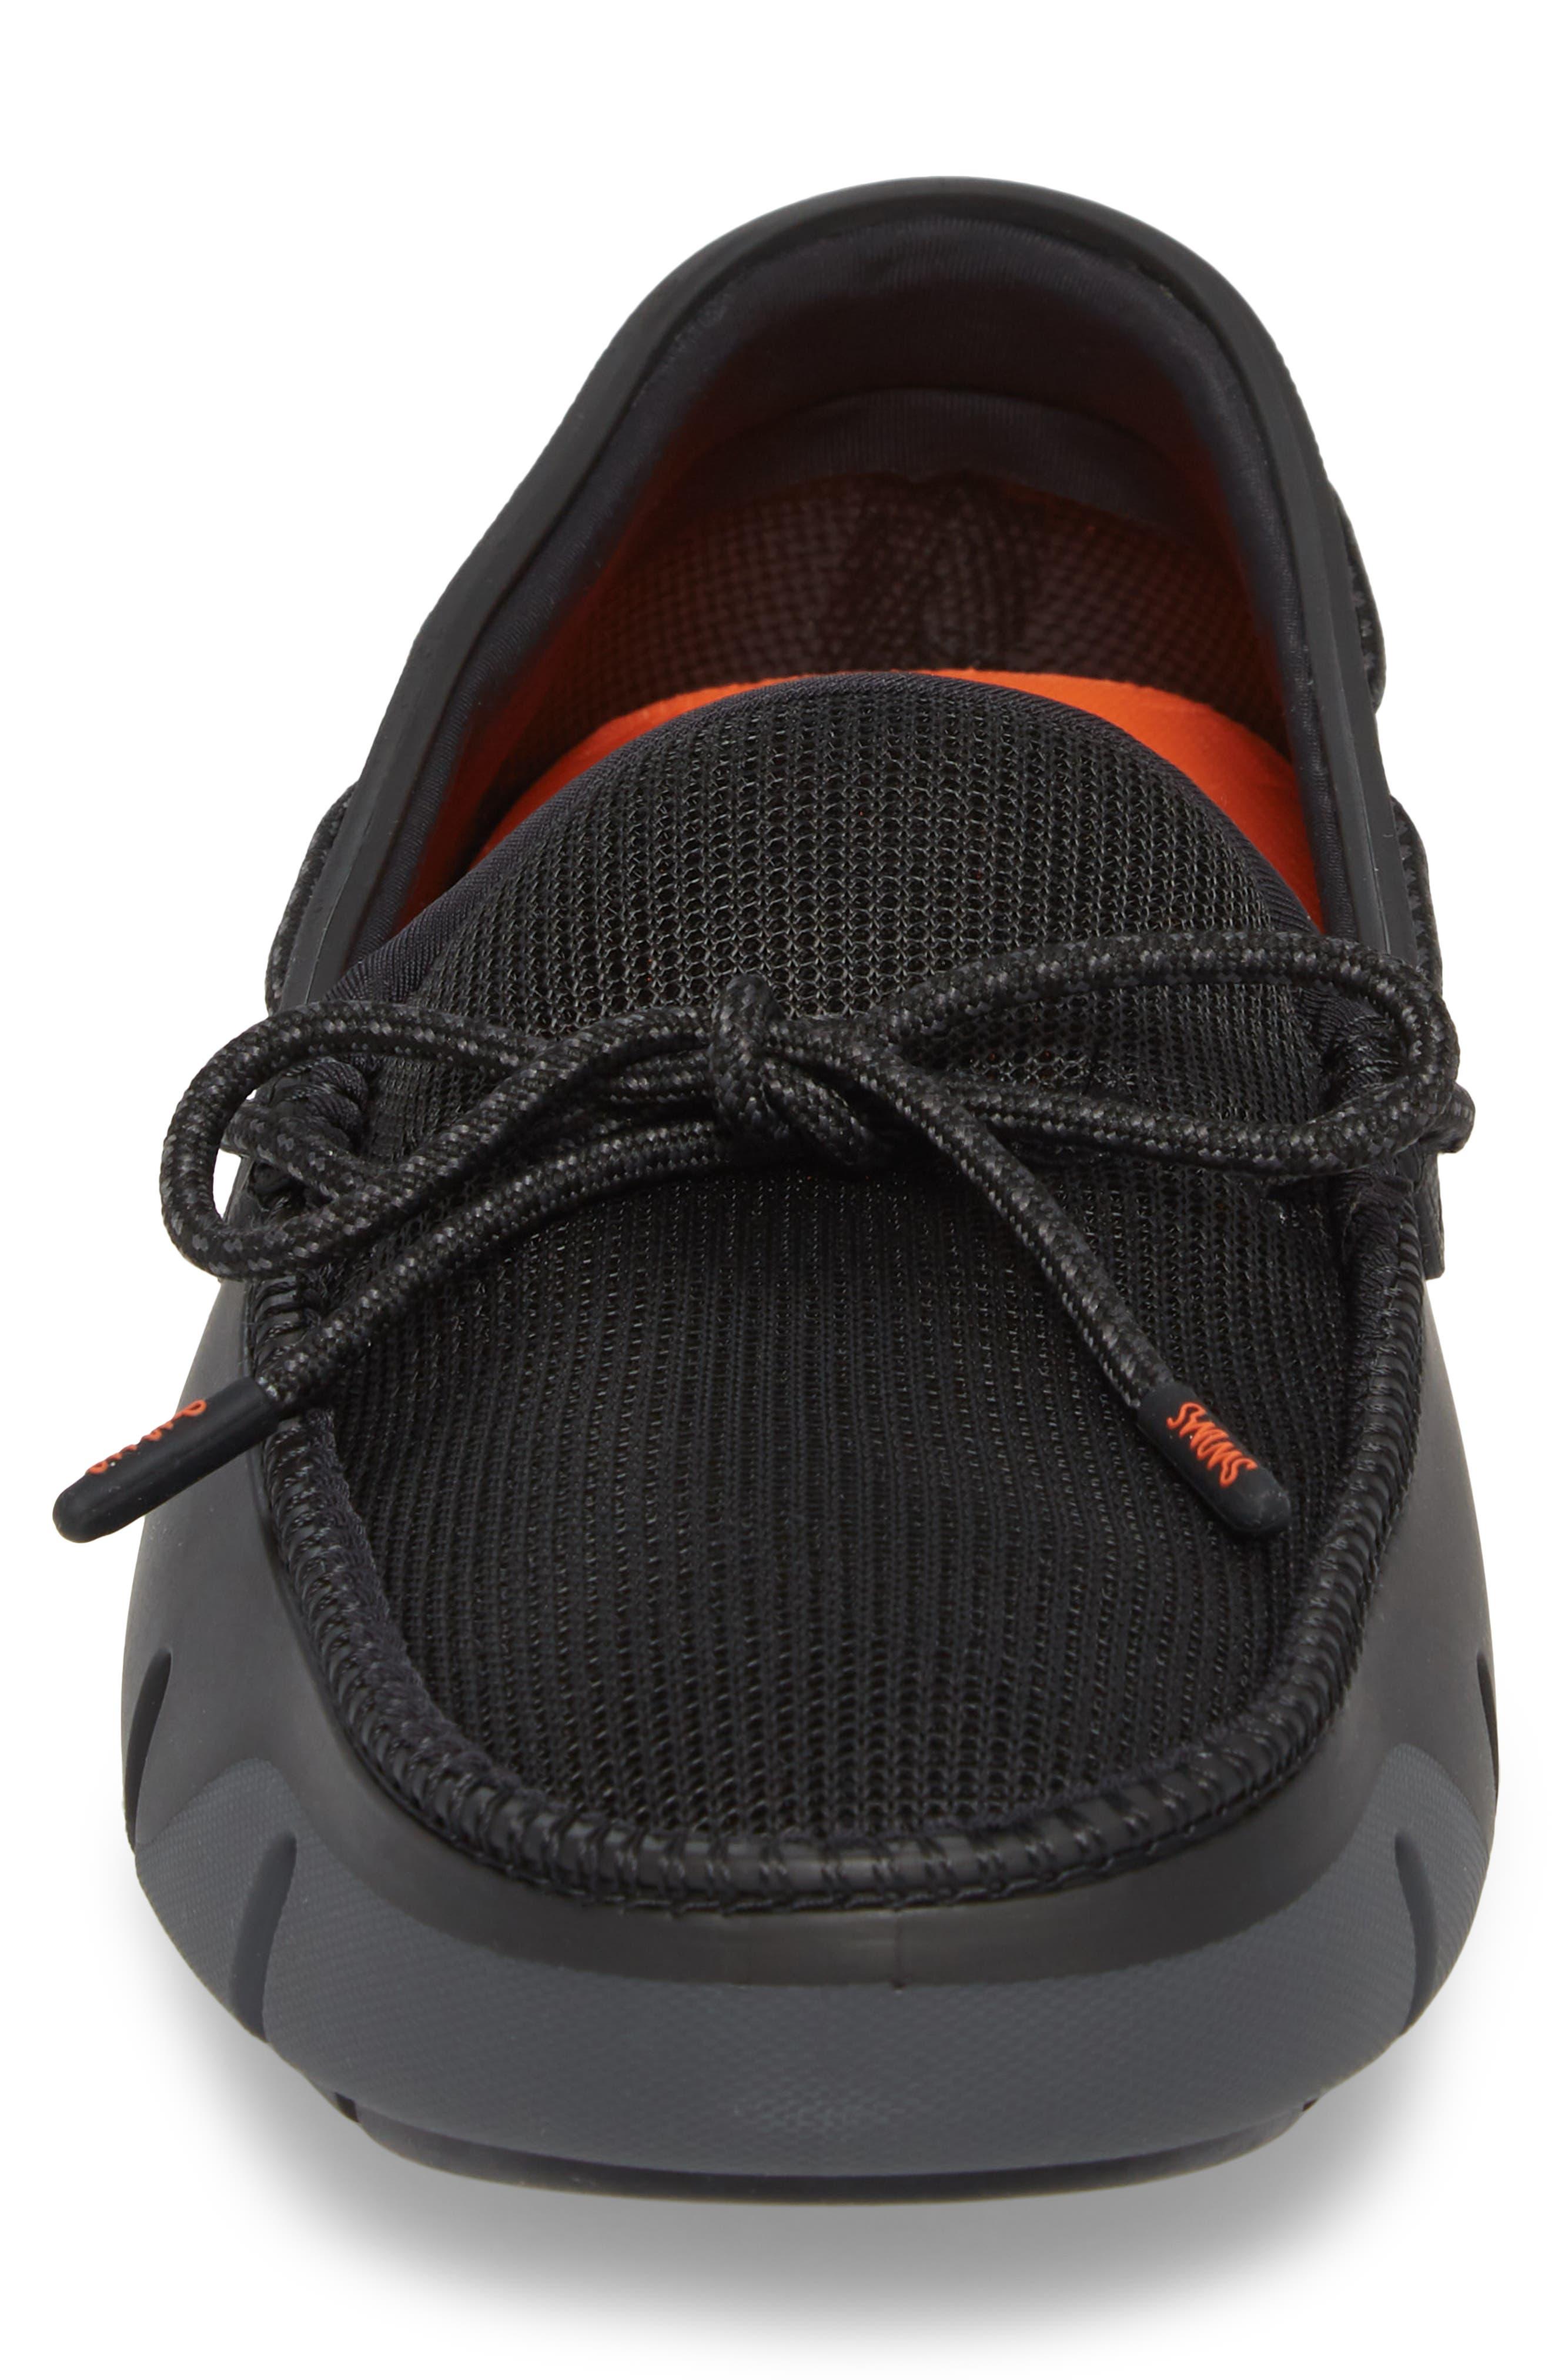 Stride Lace Loafer,                             Alternate thumbnail 4, color,                             Black / Graphite Fleck